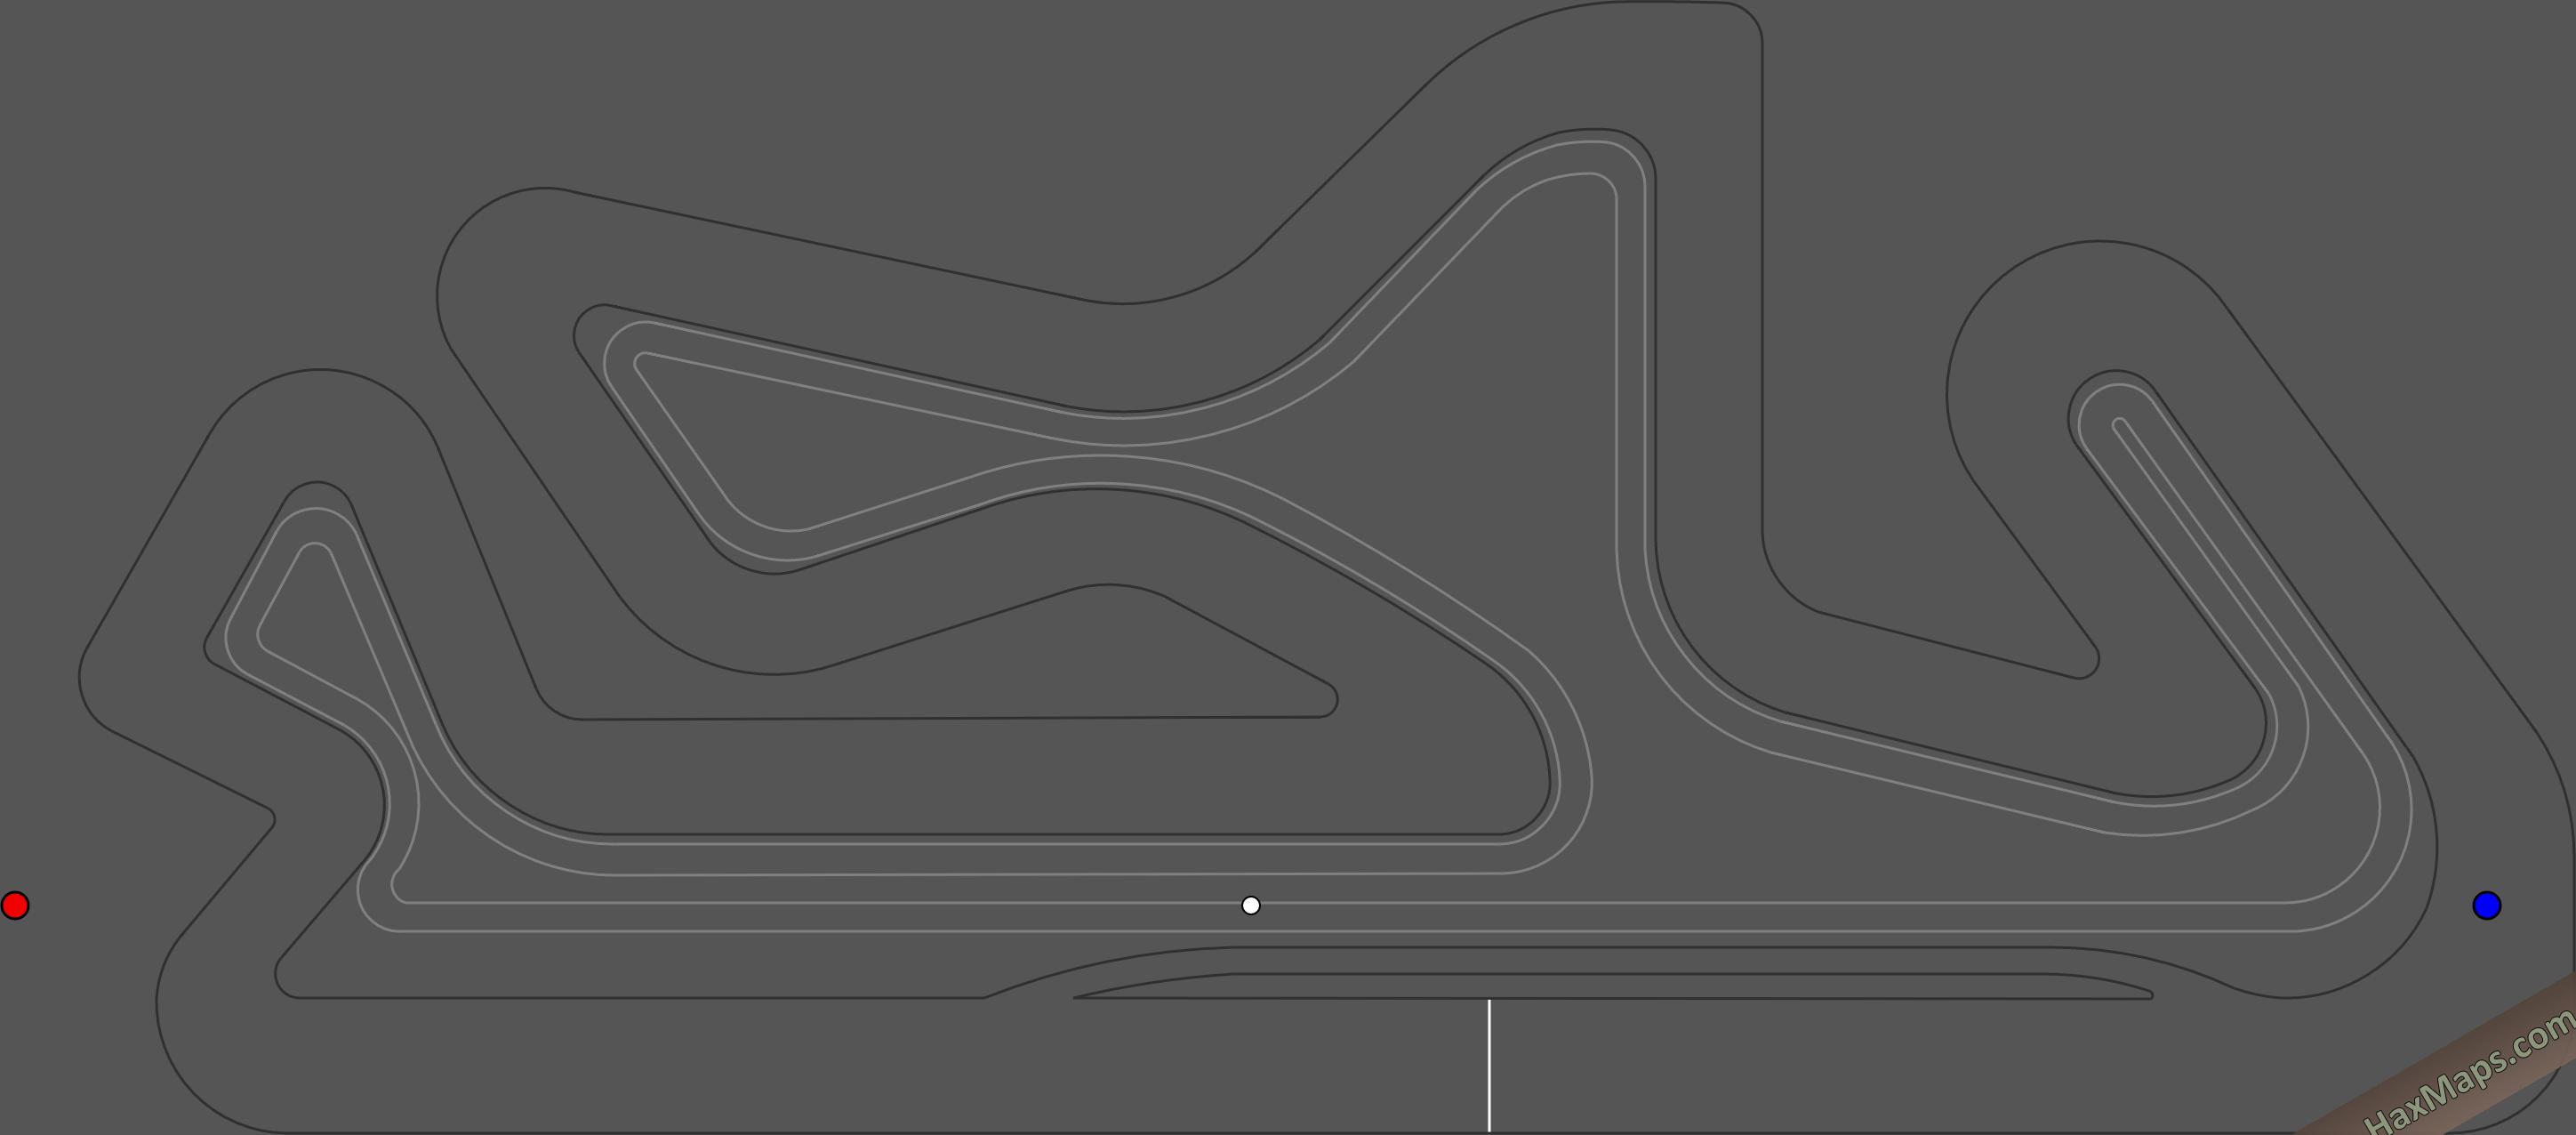 haxball maps | Q Autodromo Internacional Algavre by POPkORN